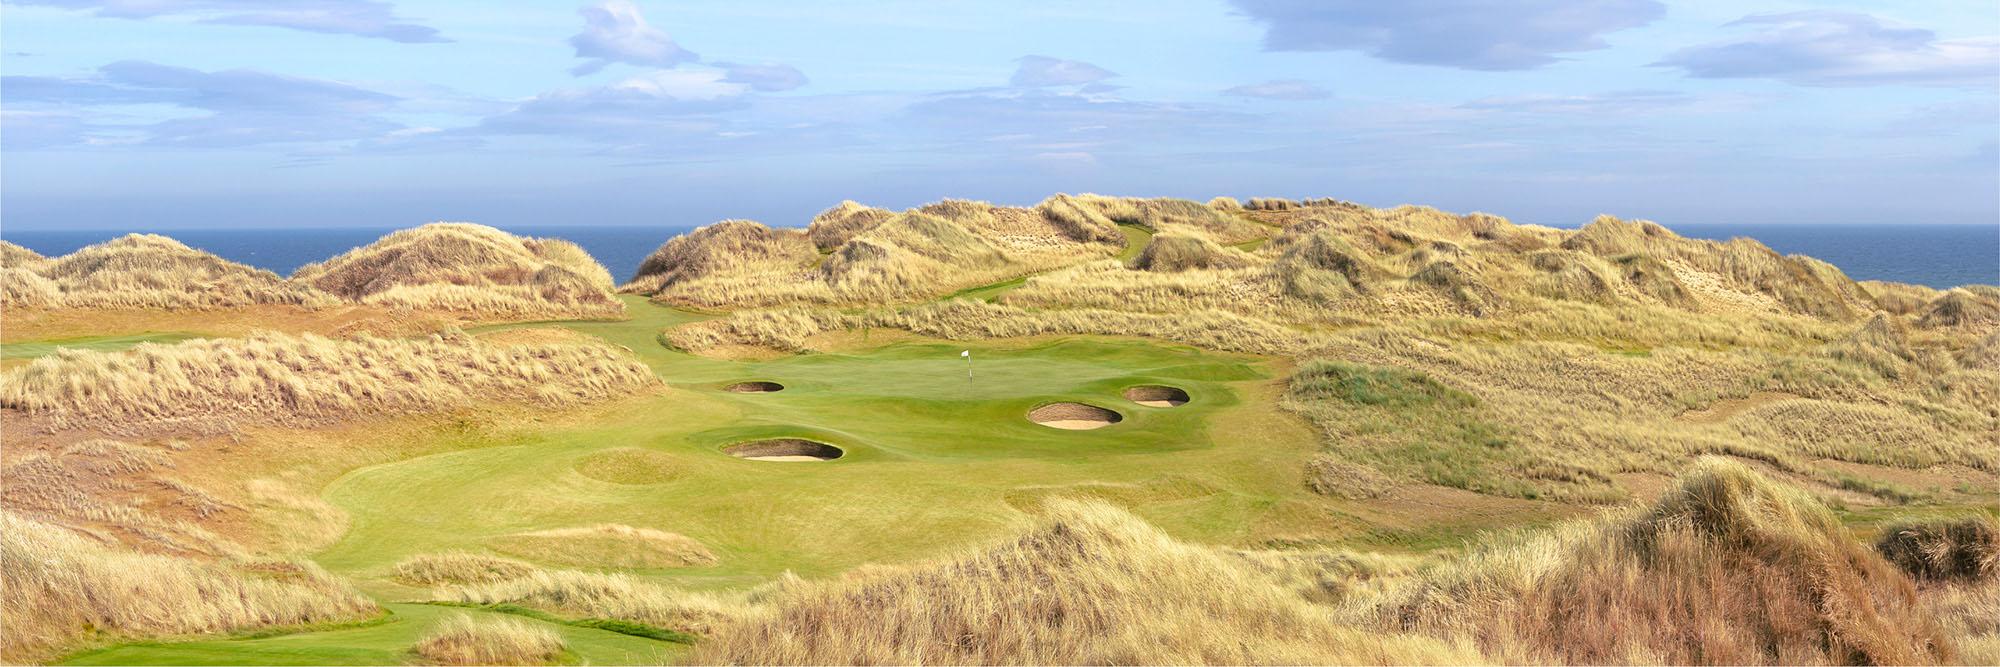 Golf Course Image - Trump International No. 13